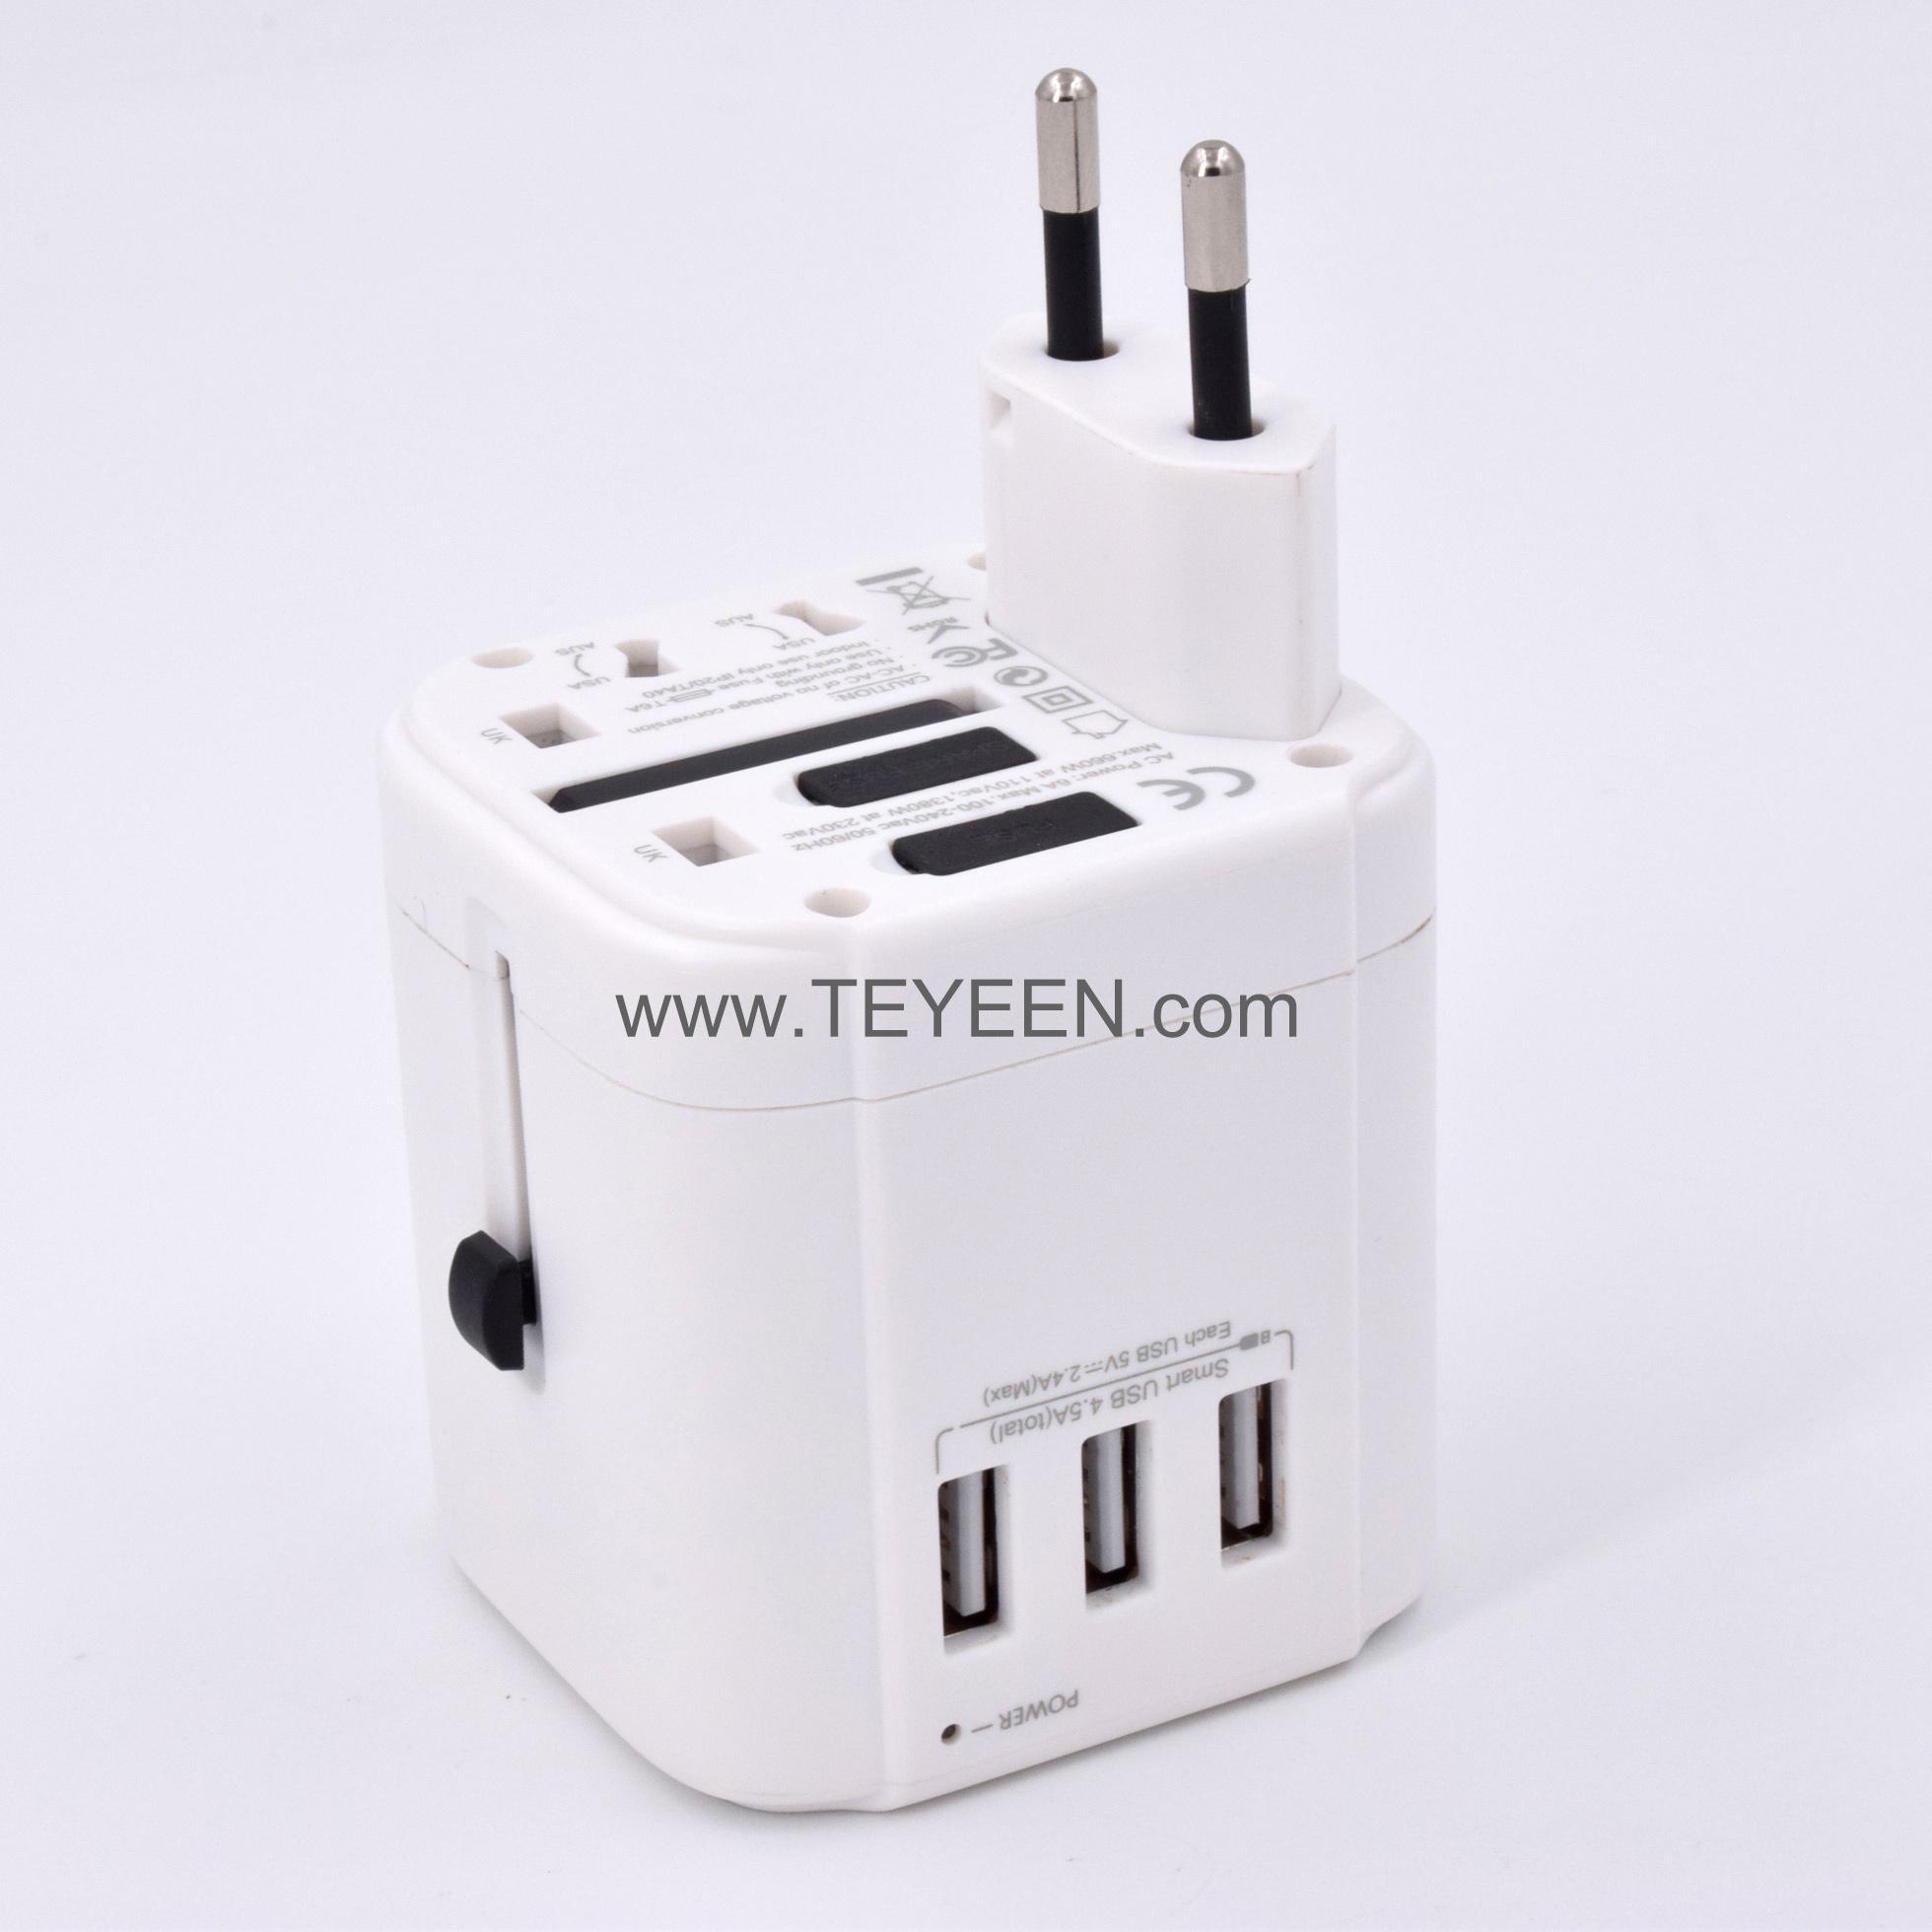 3 USB 旅行轉換插頭 5